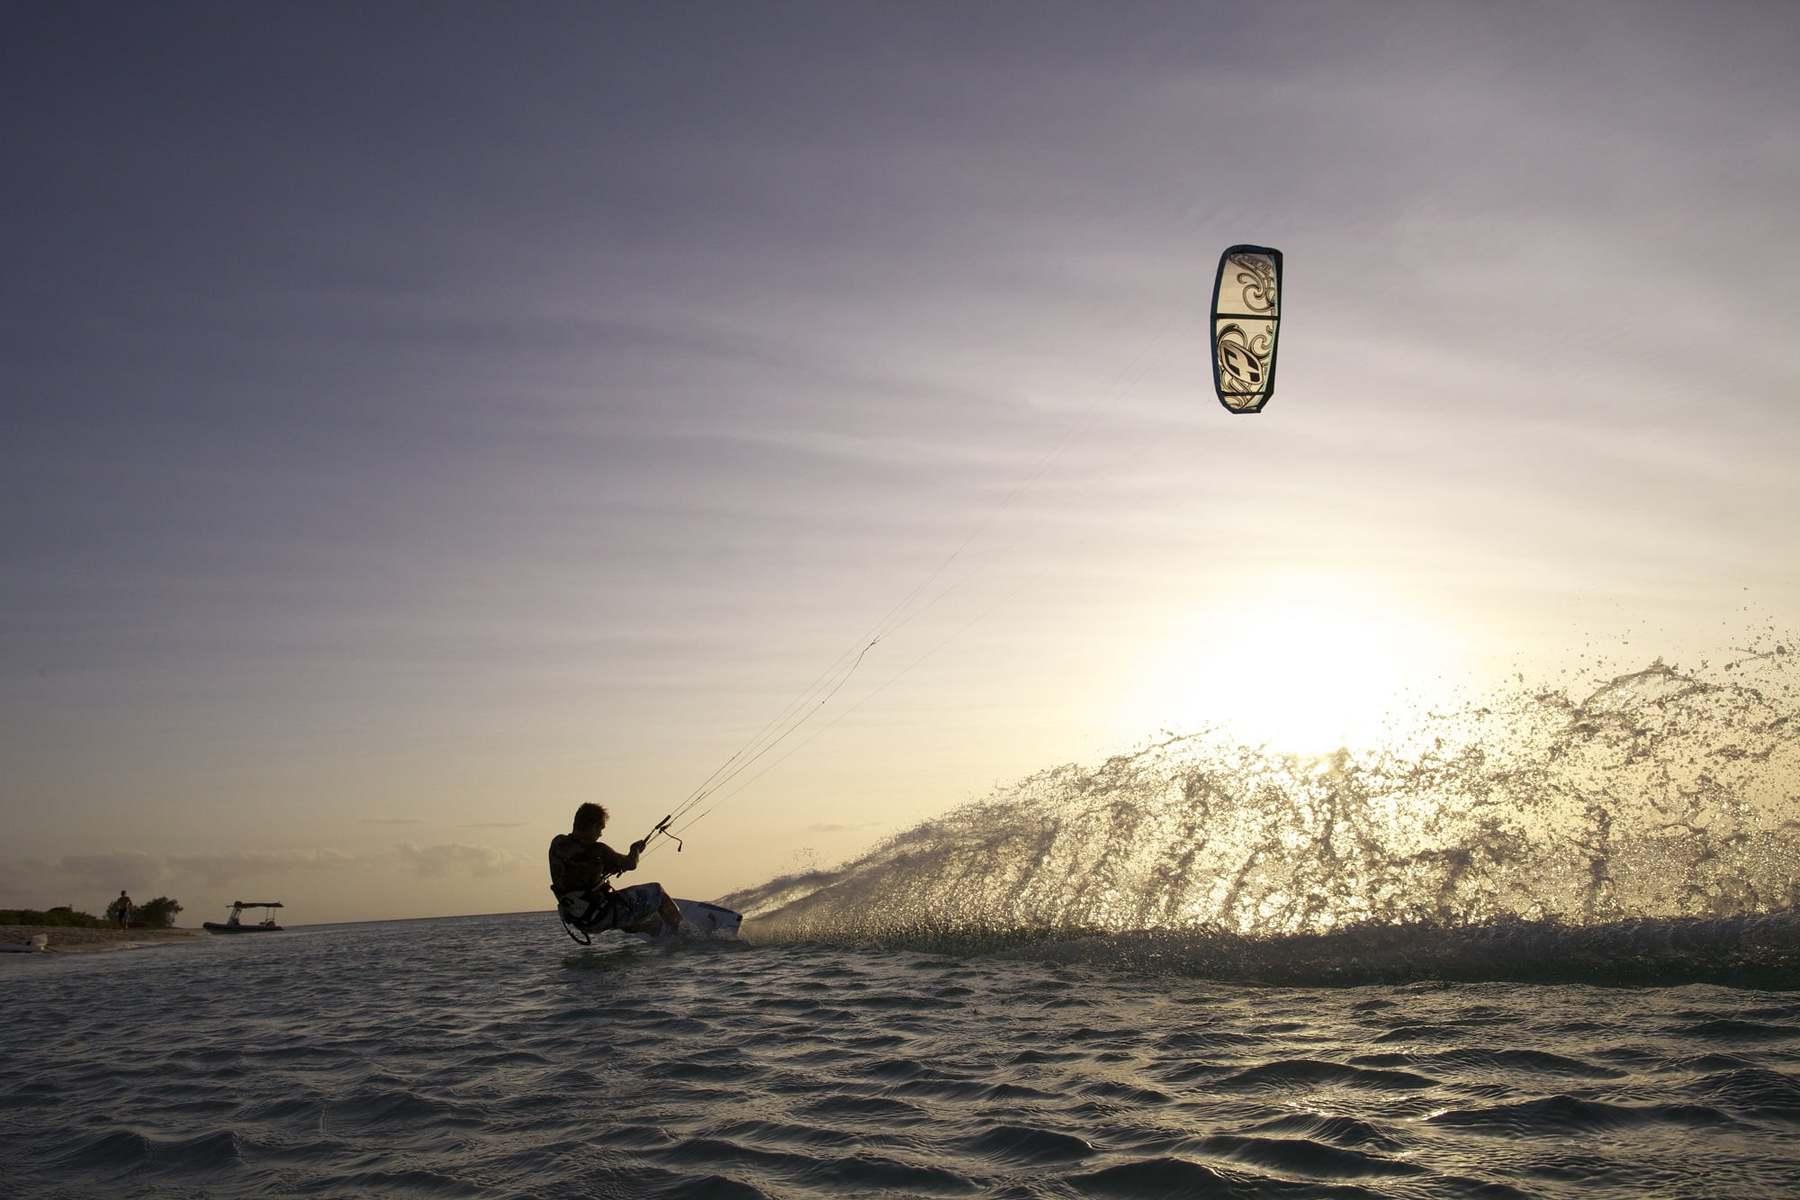 Kitesurfing port douglas qld